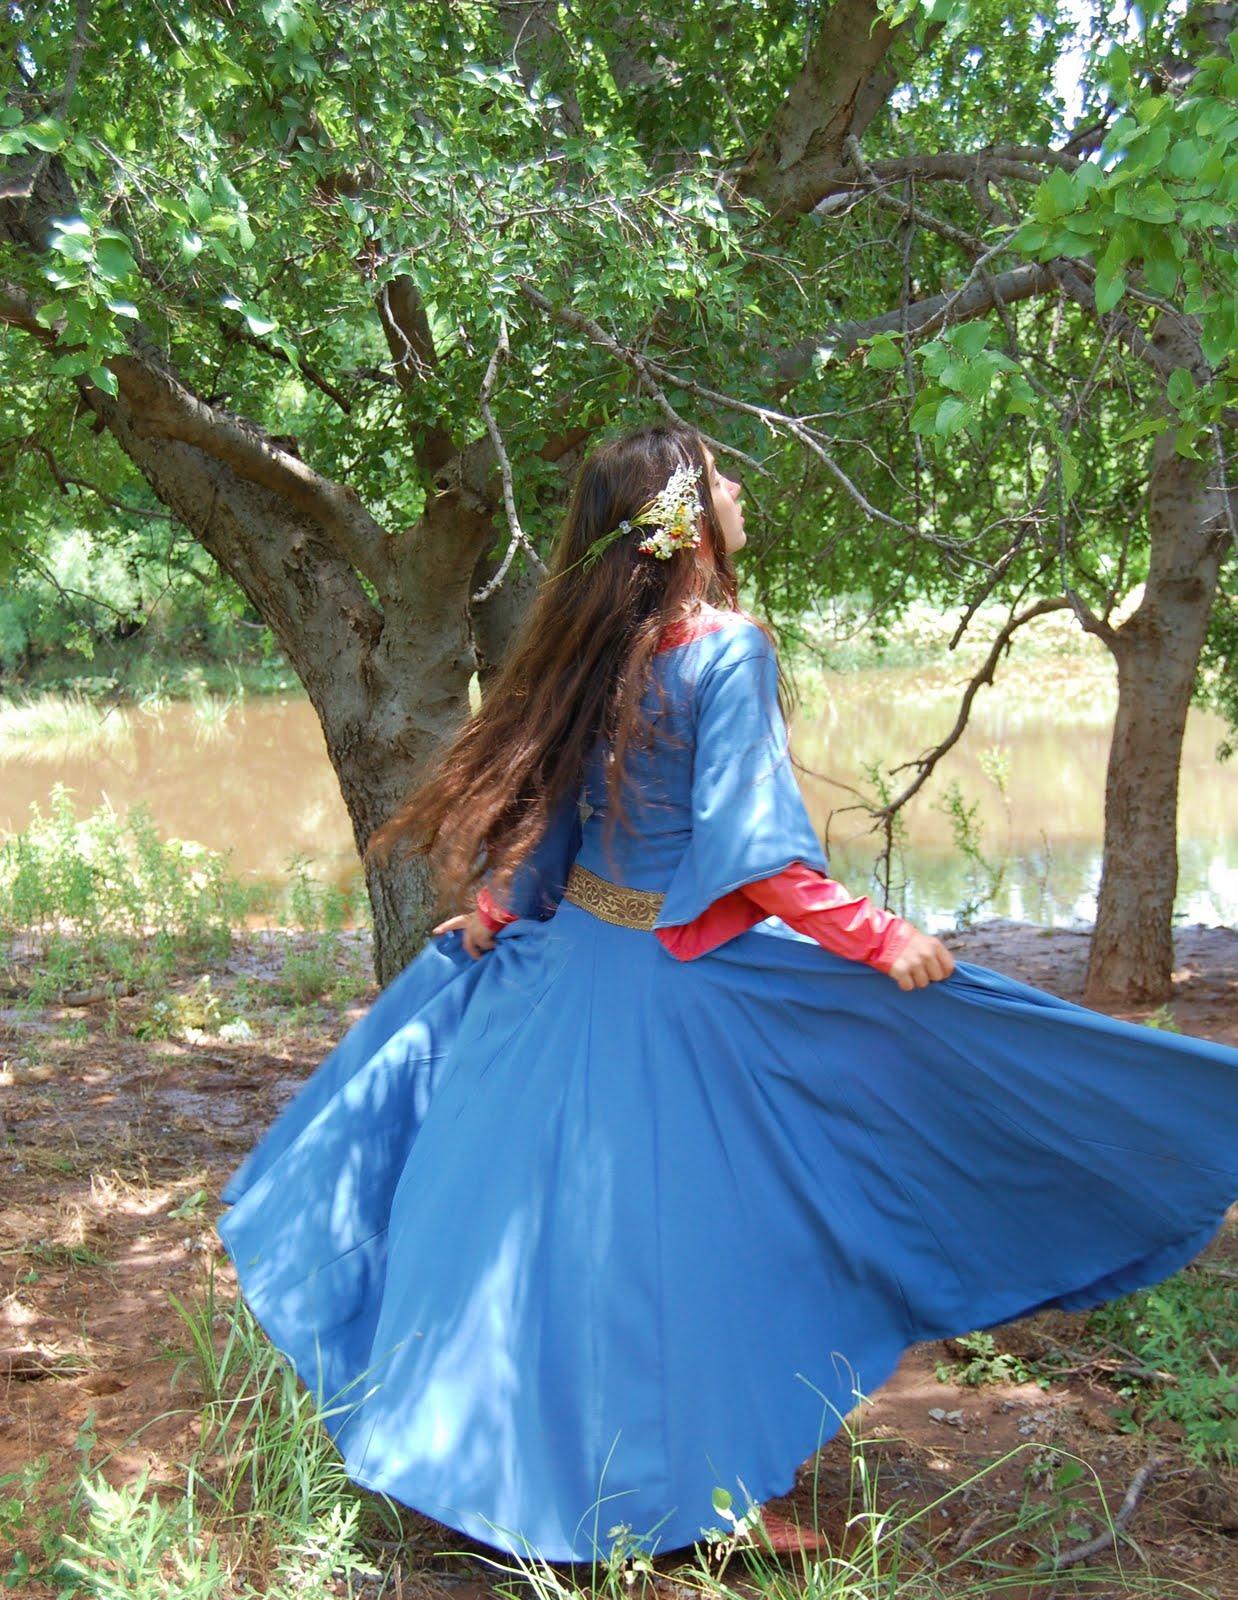 Tunics: Meval Knights - Gothic Warrior - Renaissance Clothing